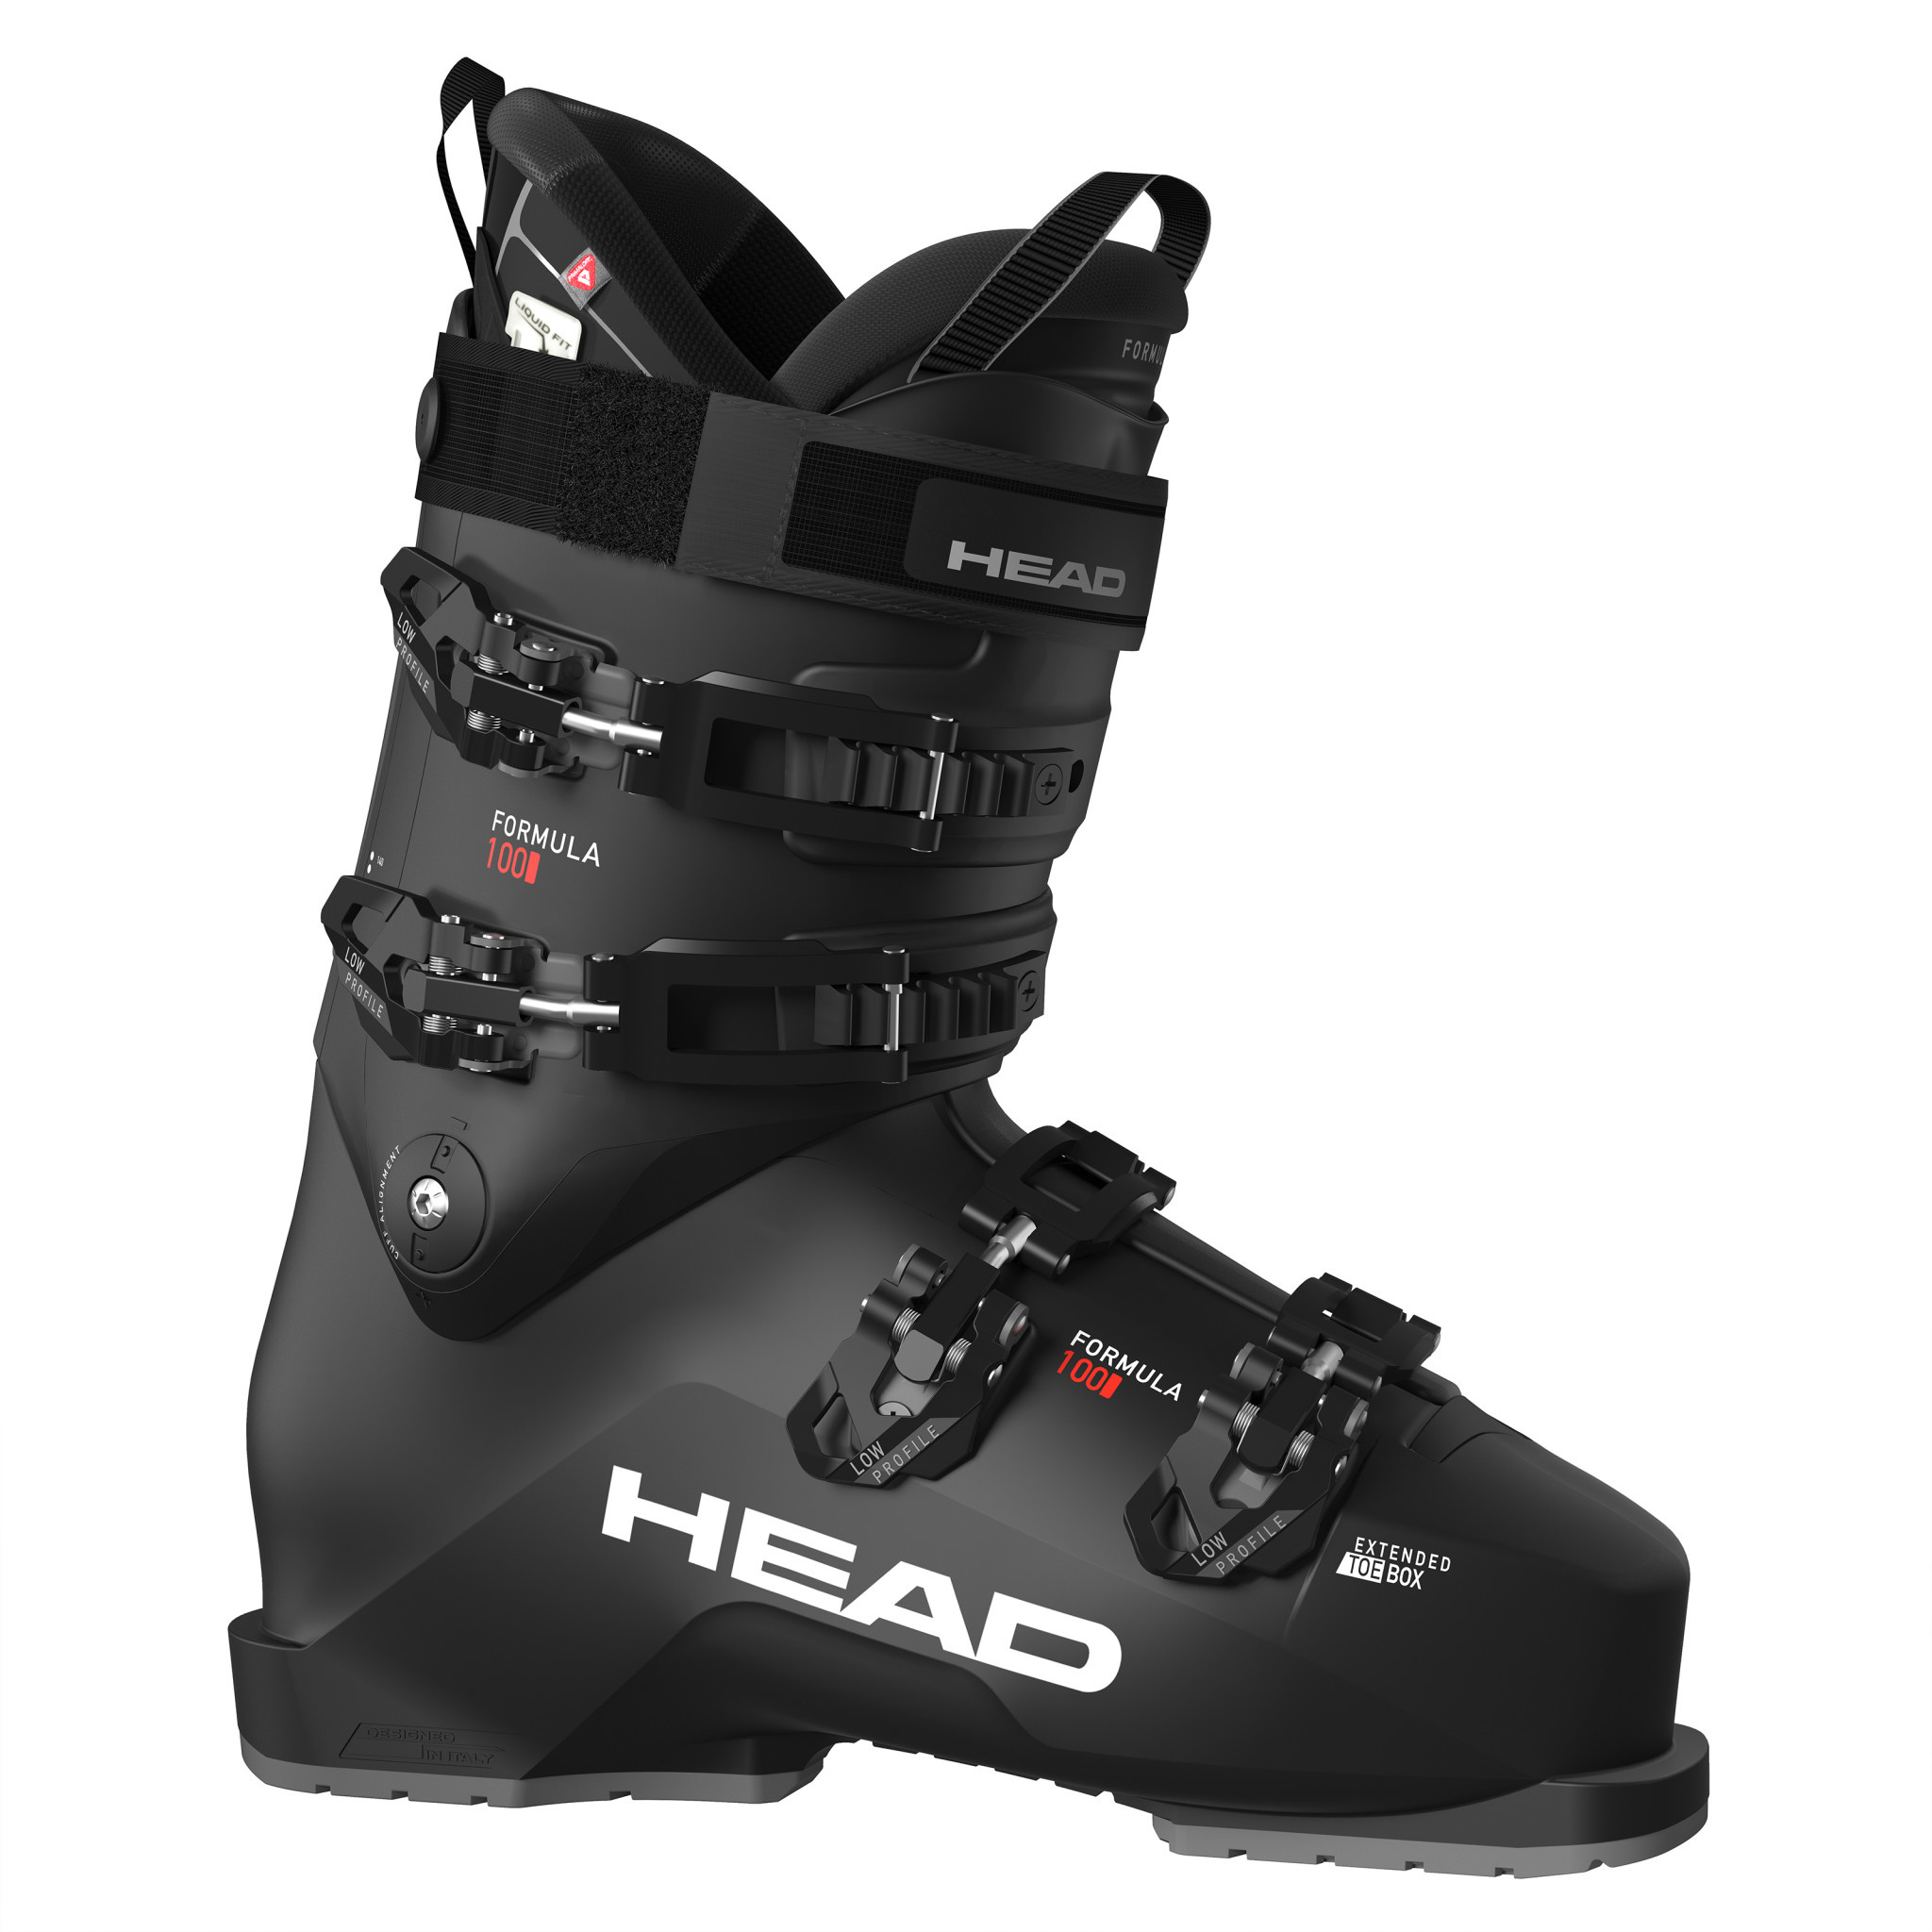 Head Head M's Formula 100 Ski Boot